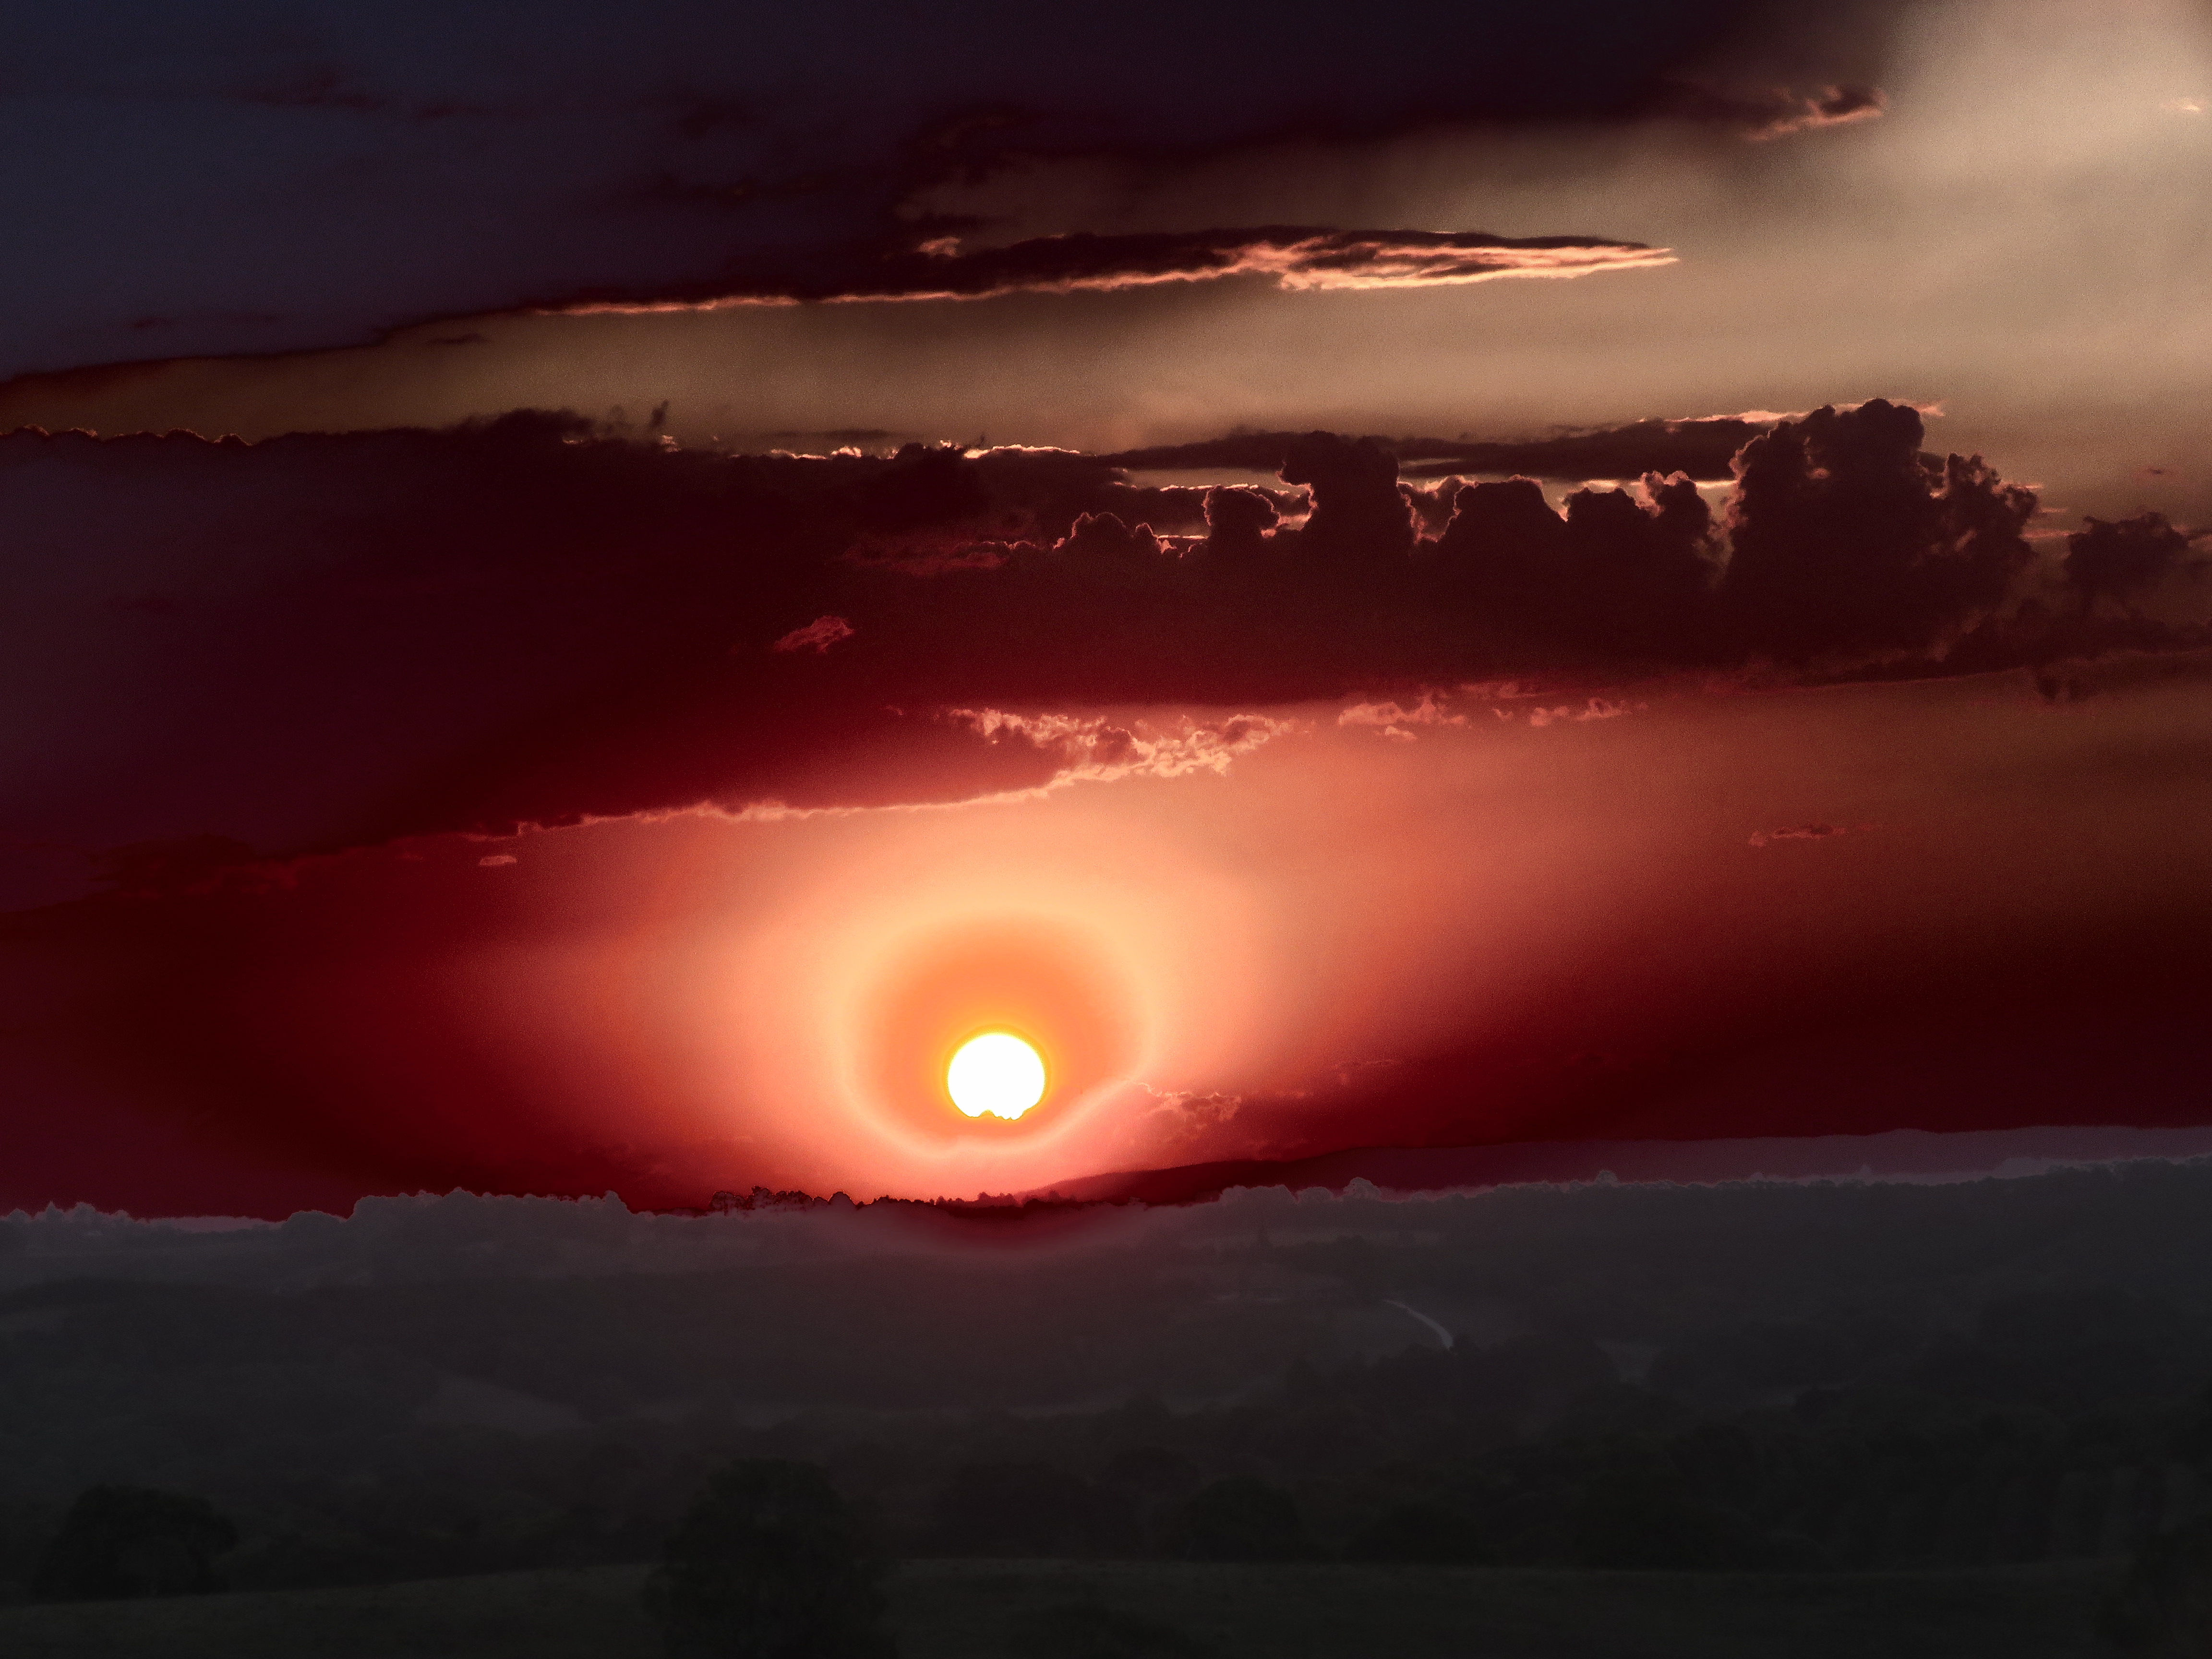 180425_blog challenge_heat_sun3